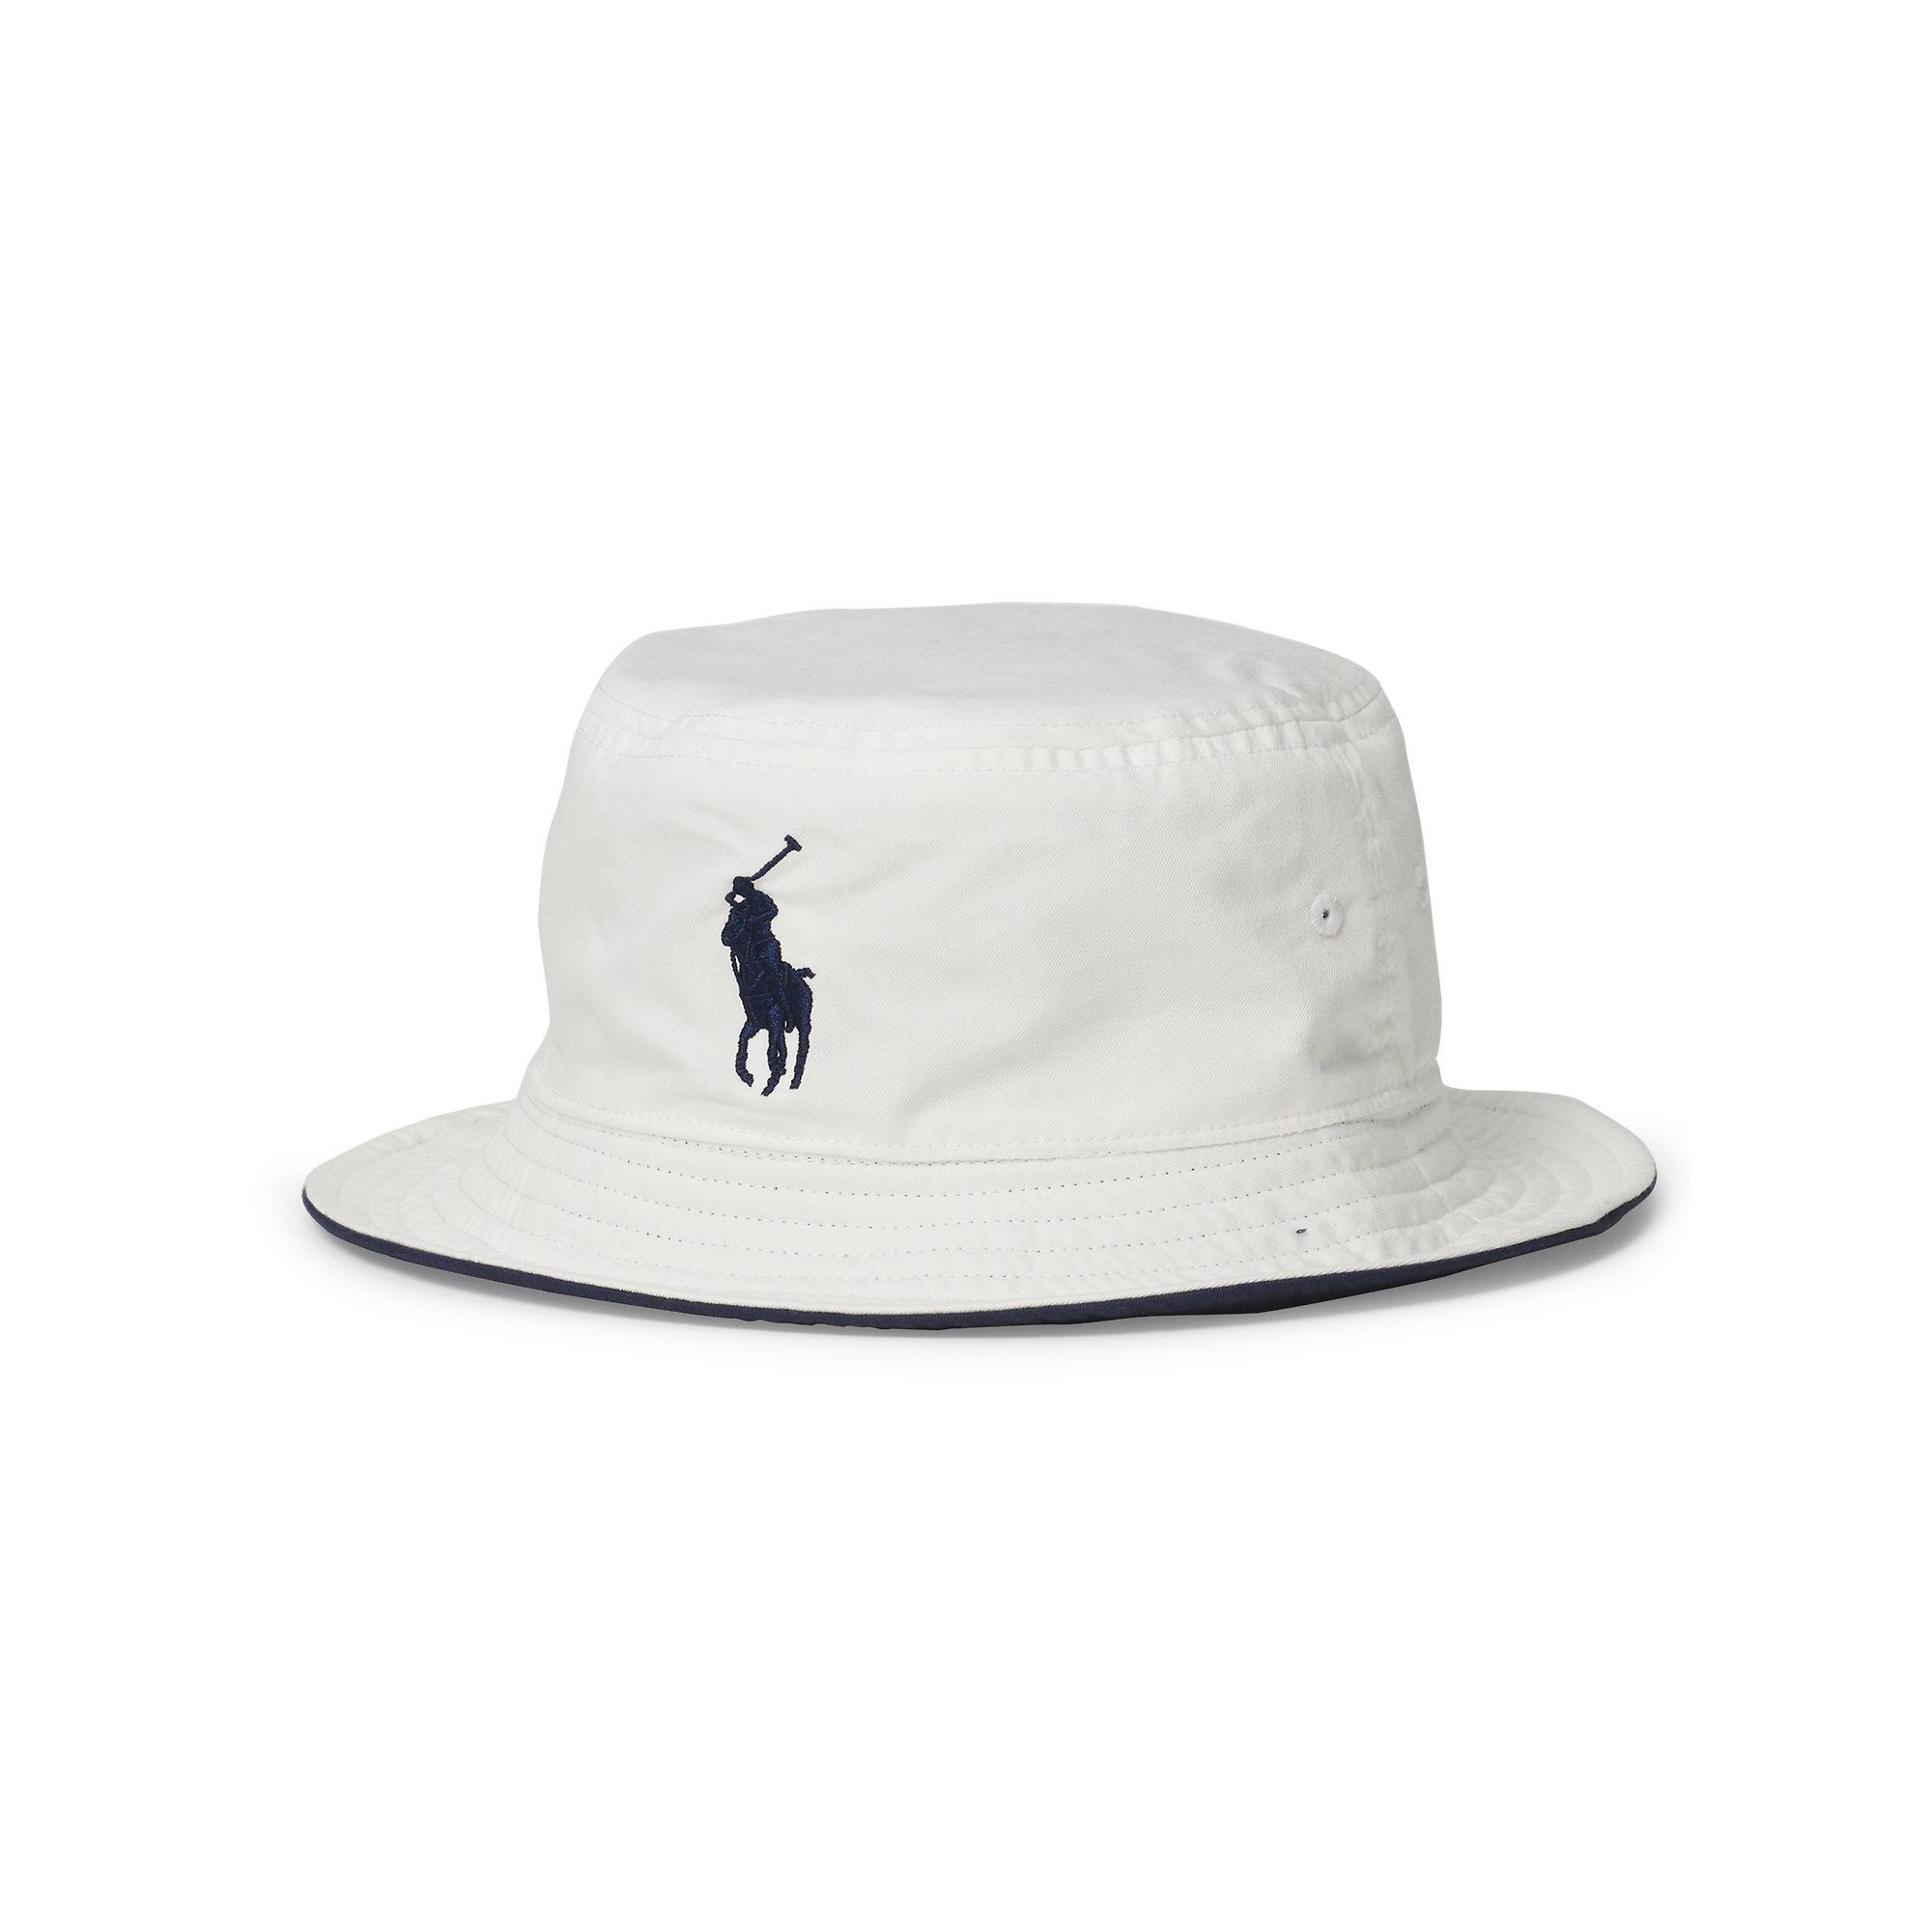 Lyst - Polo Ralph Lauren Us Open Reversible Bucket Hat in White for Men 8680975c6a5